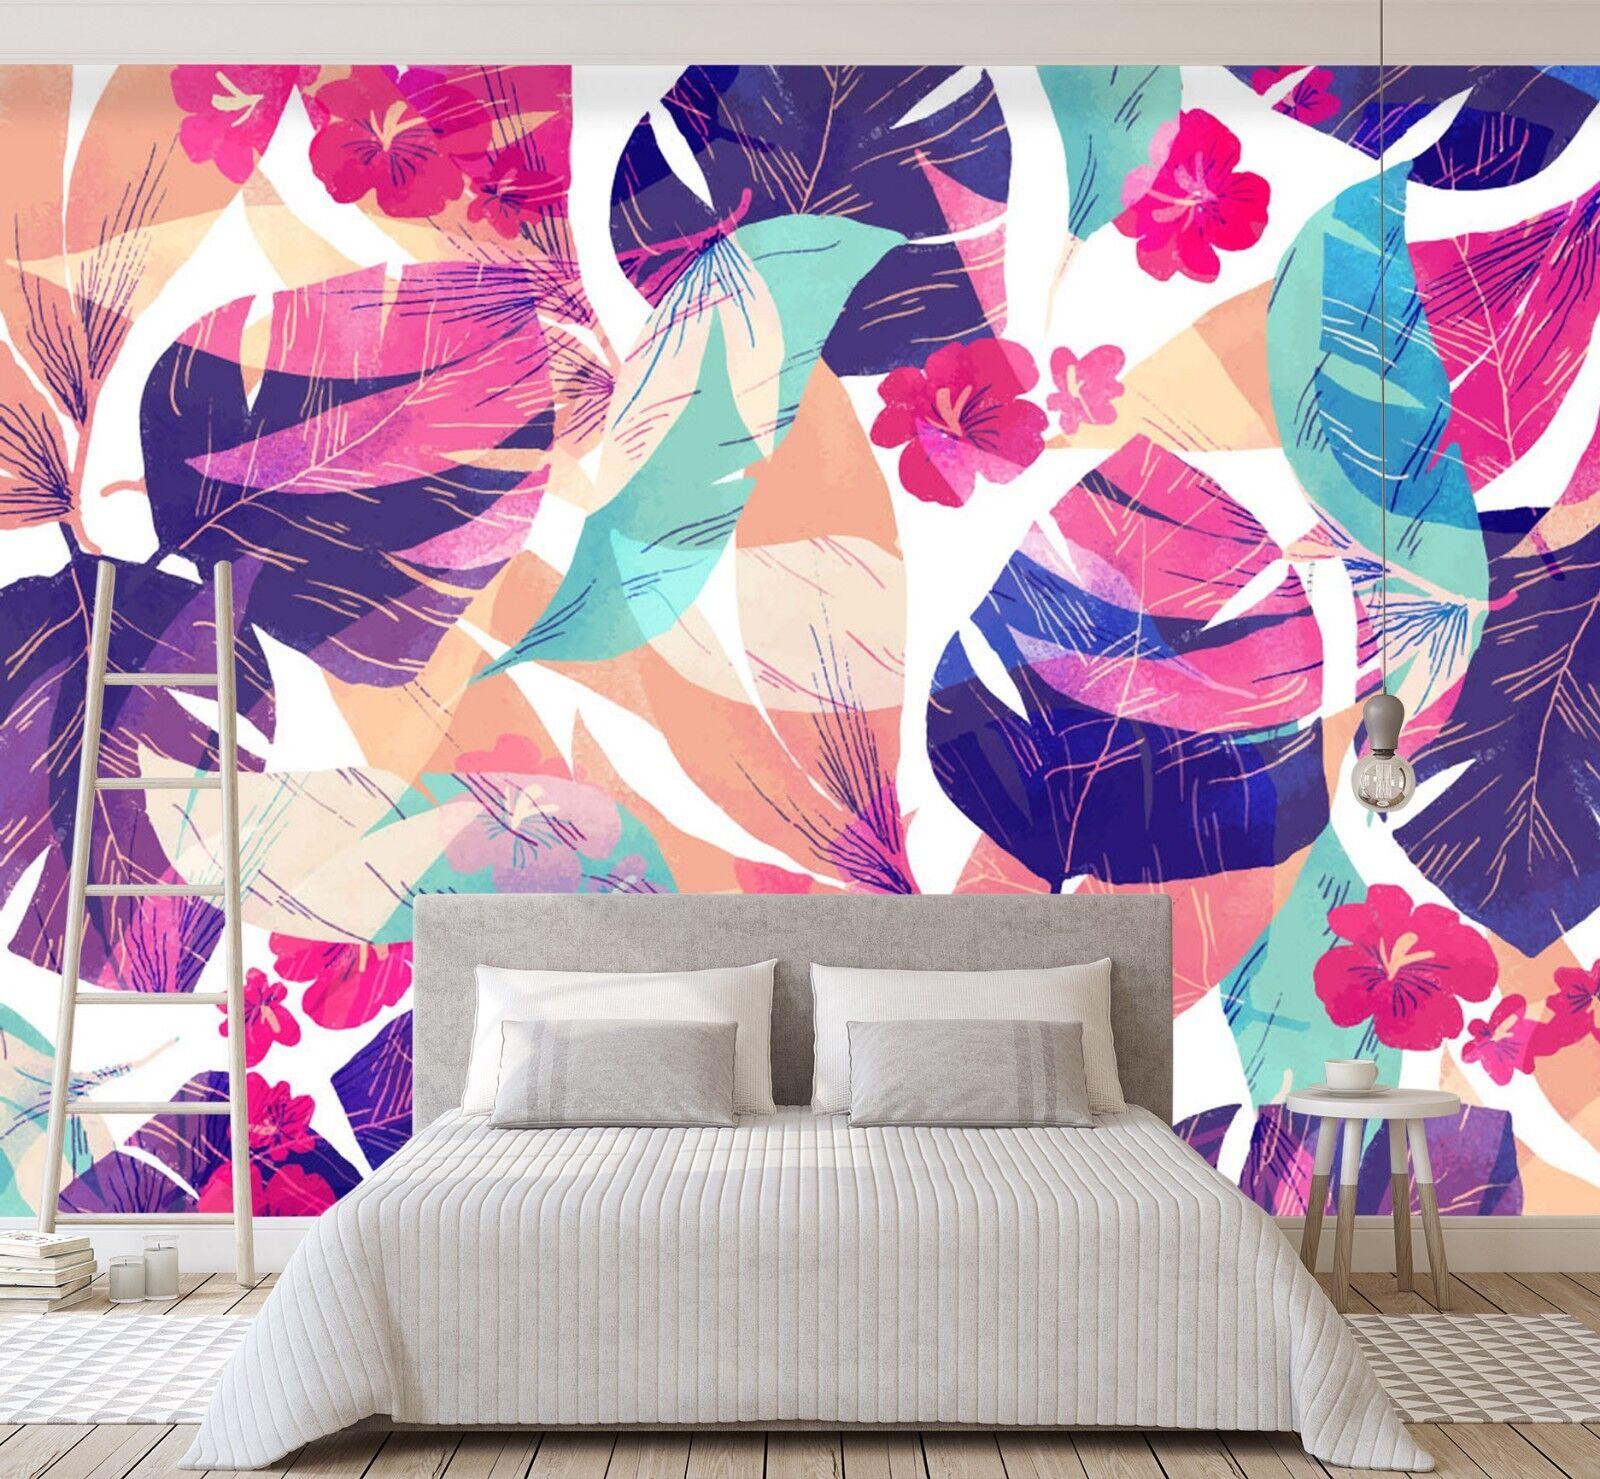 3D Petal Leaves Farbeful 52 Wall Paper Wall Print Decal Wall Deco Indoor Murals